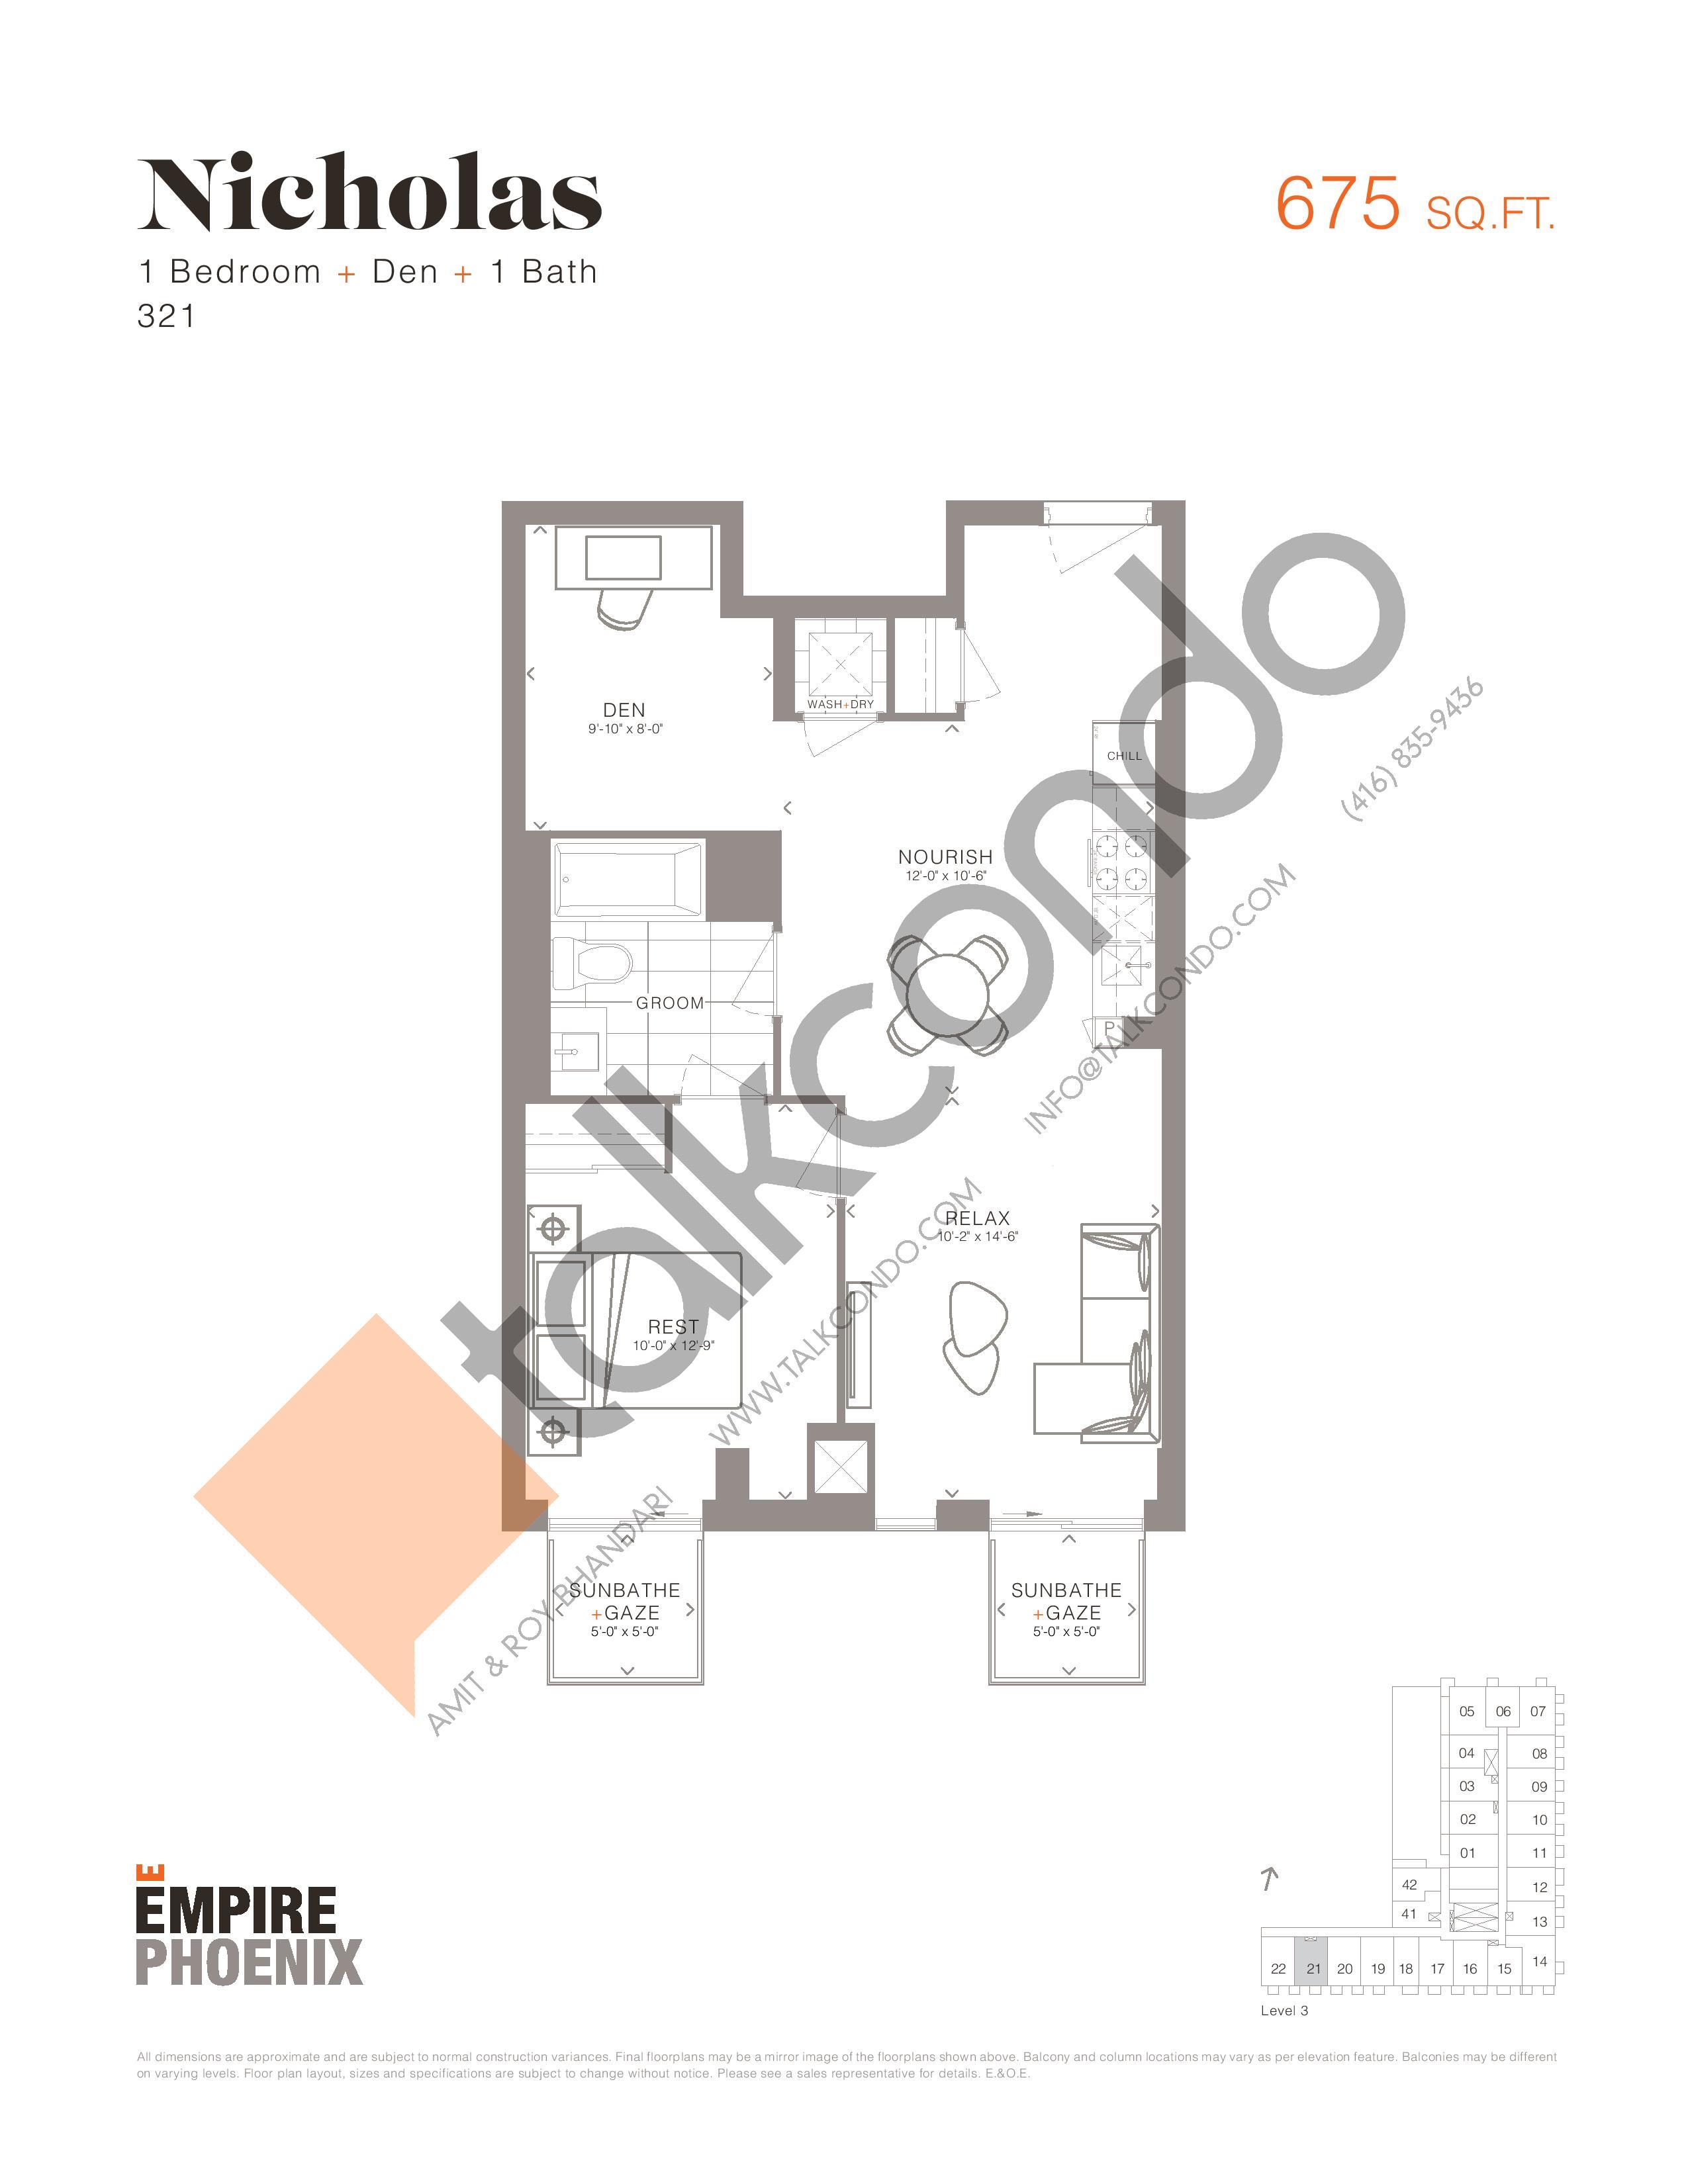 Nicholas Floor Plan at Empire Phoenix Condos - 675 sq.ft